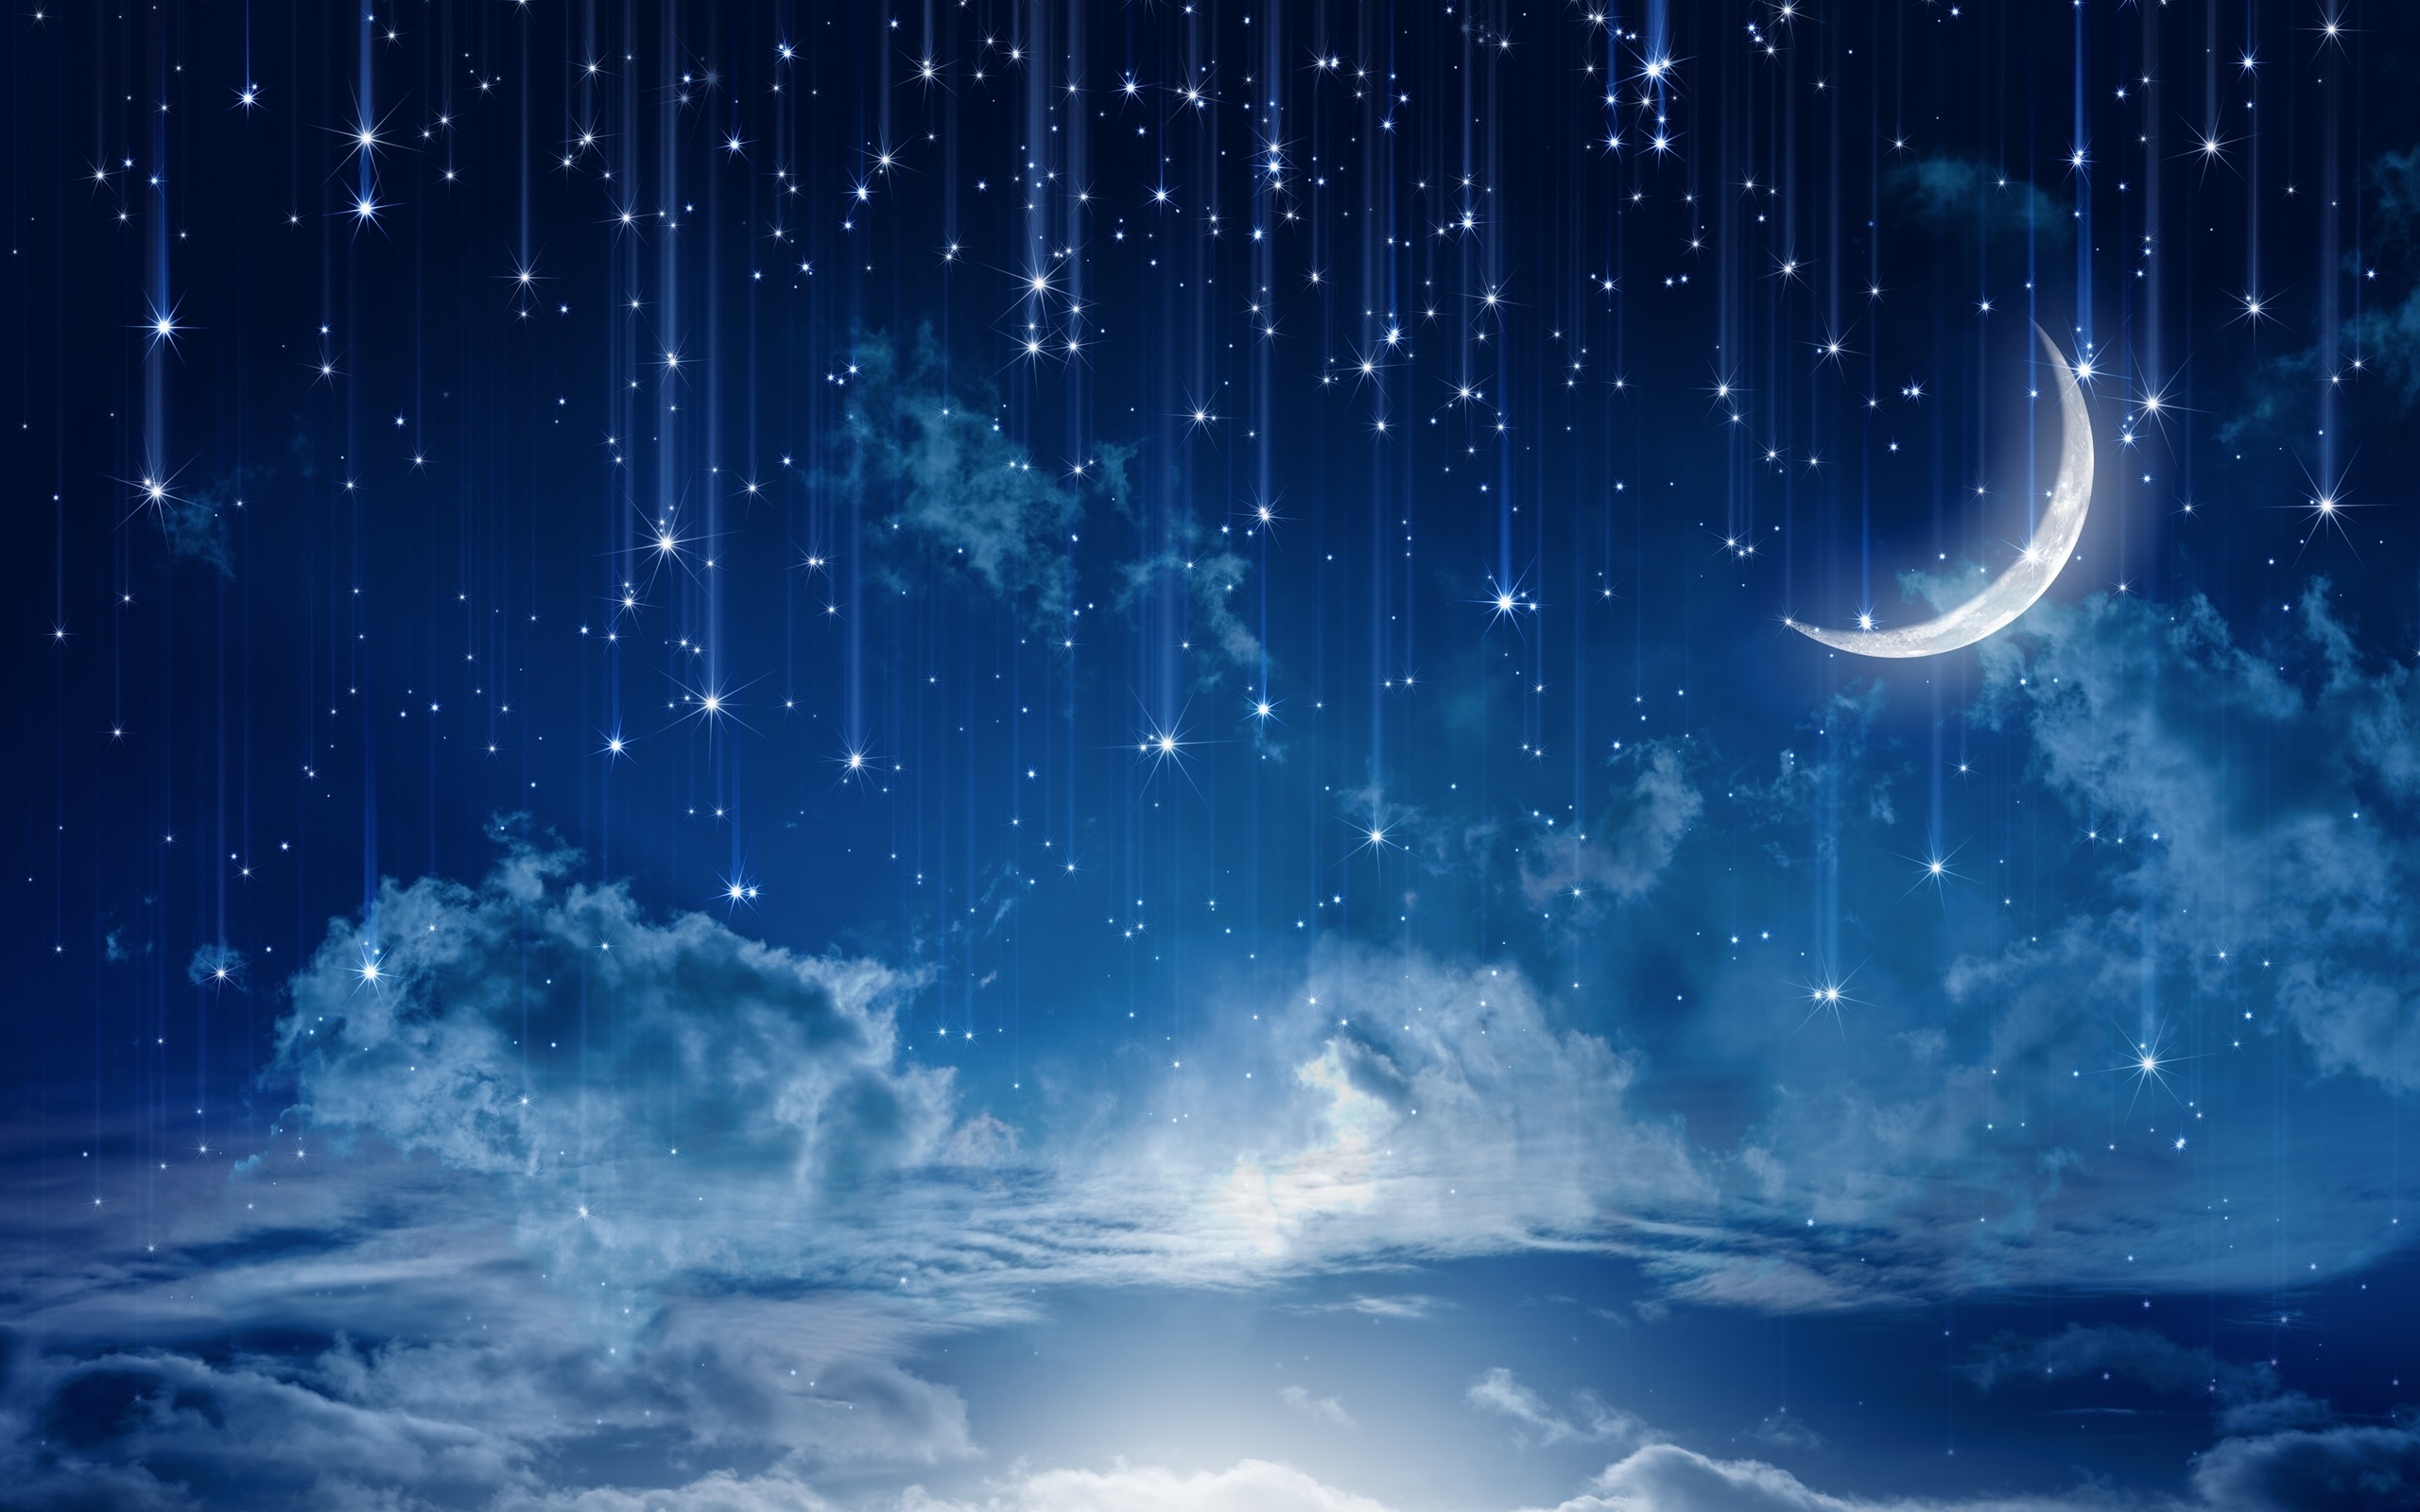 sky moonlight nature night stars clouds rain landscape moon wallpaper 2560x1600